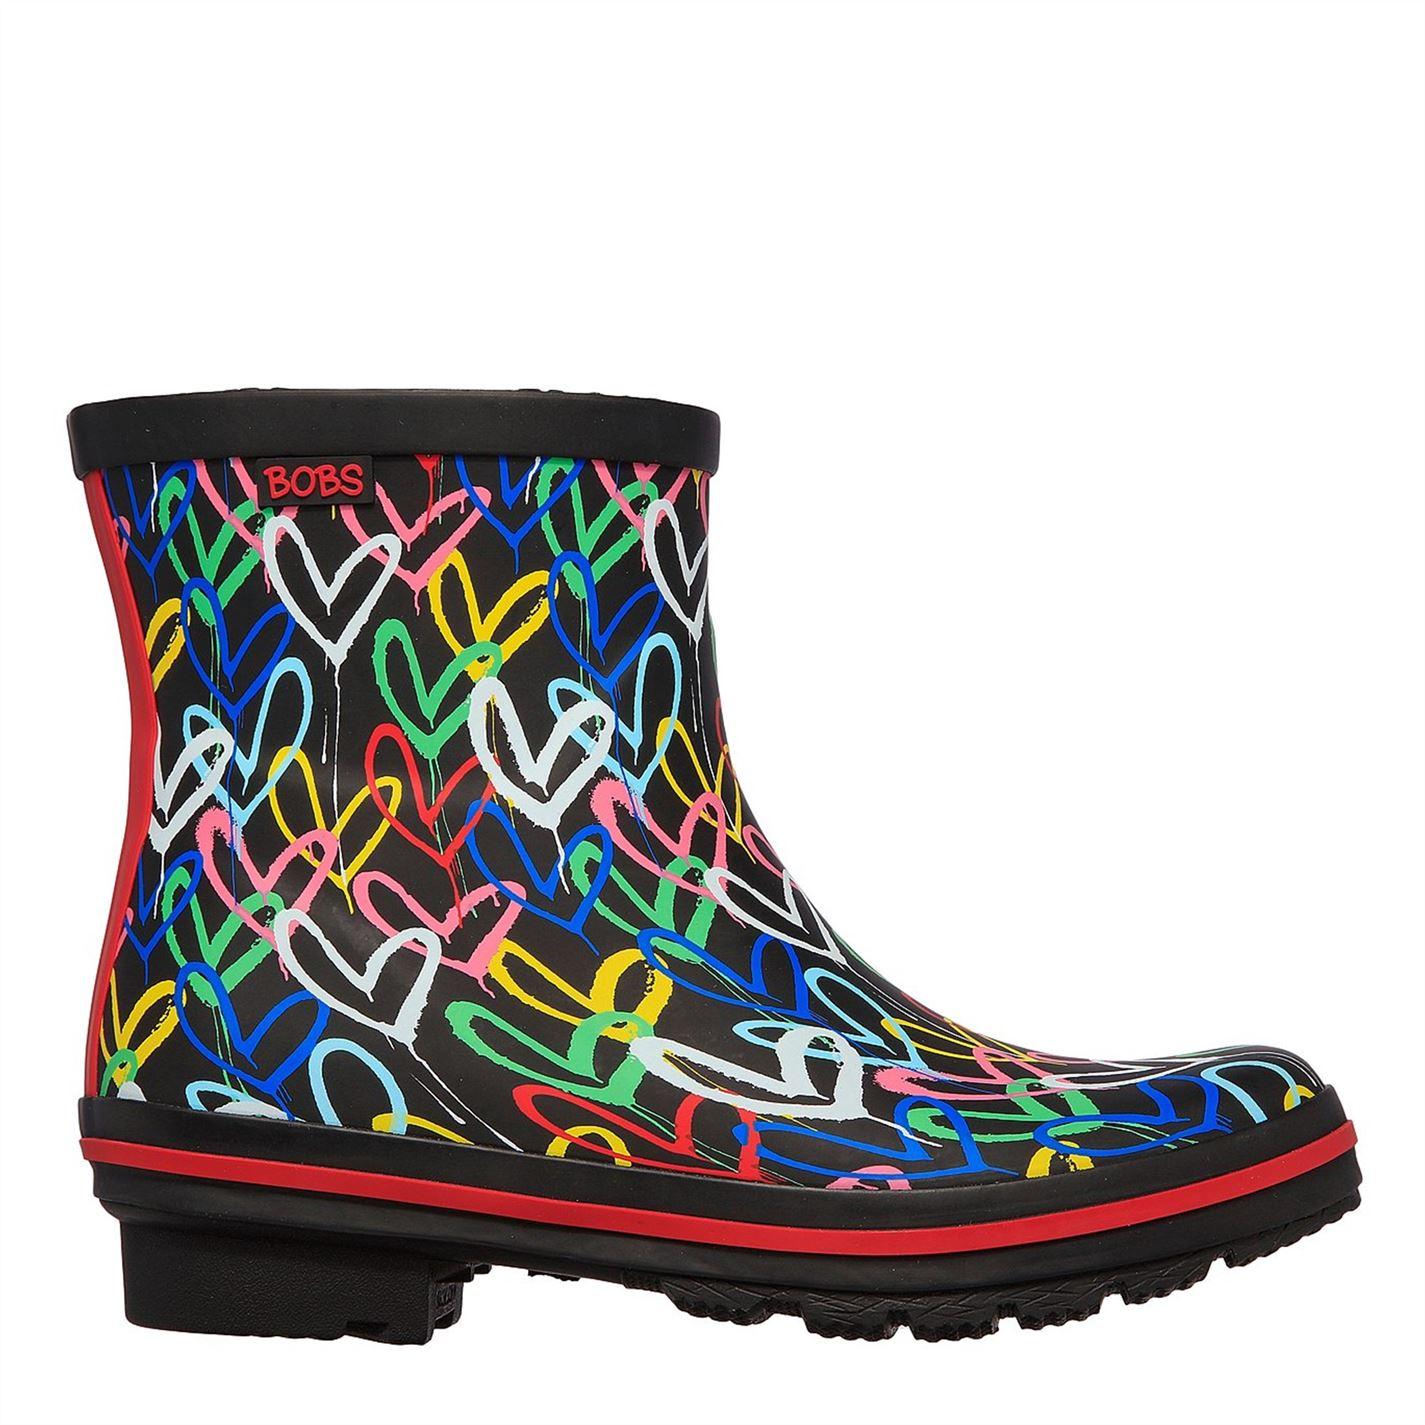 Skechers ploaie Check Ld12 negru multicolor